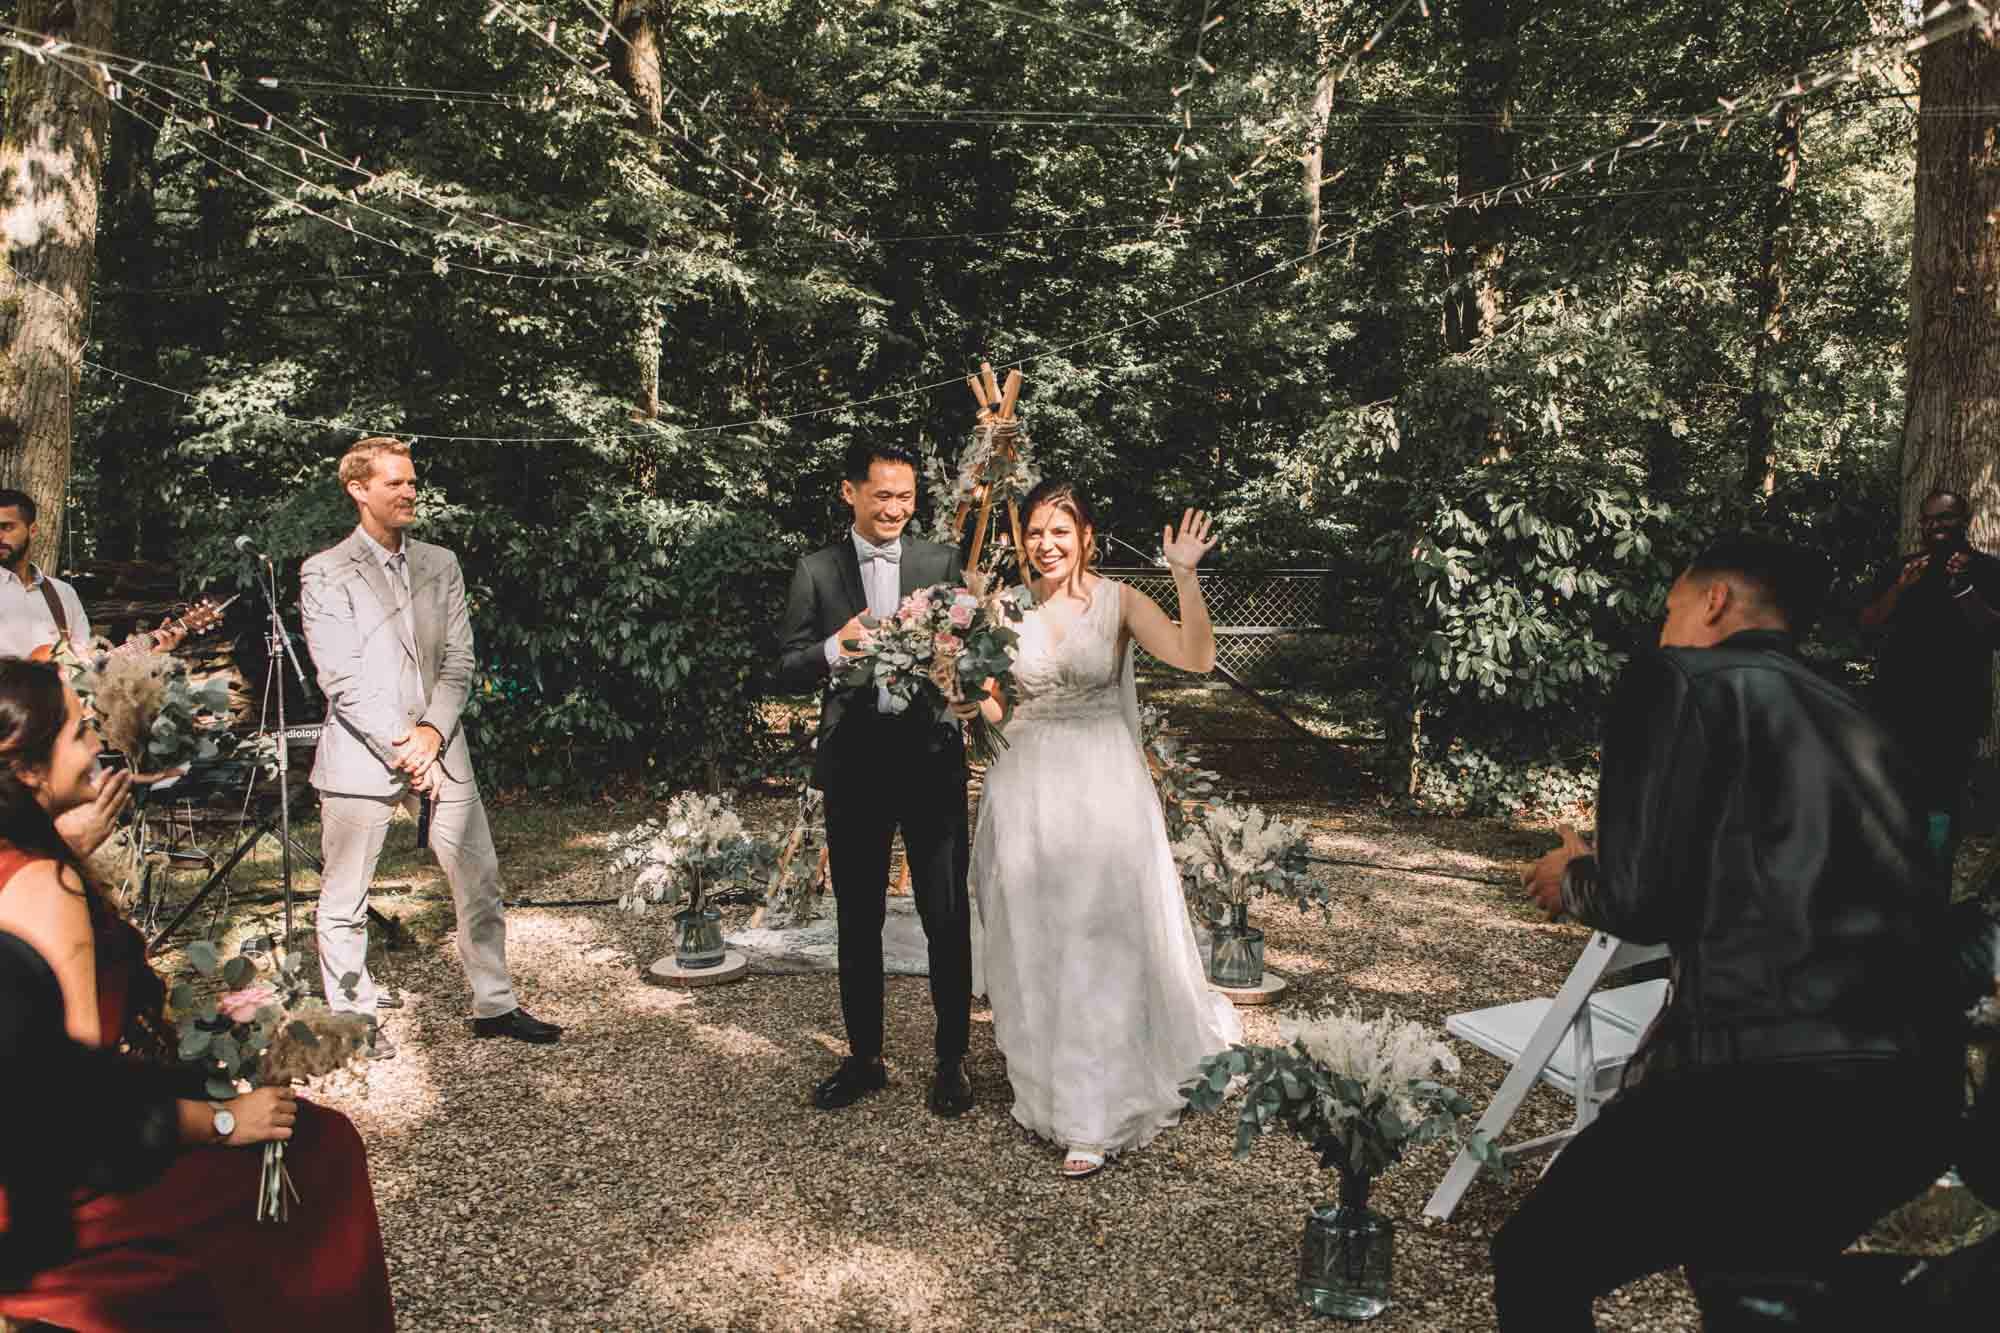 SOPHIA+THIBAUD_MANOIR SAINT HUBERT_PHOTOGRAPHE_MARIAGE_LES BANDITS-30